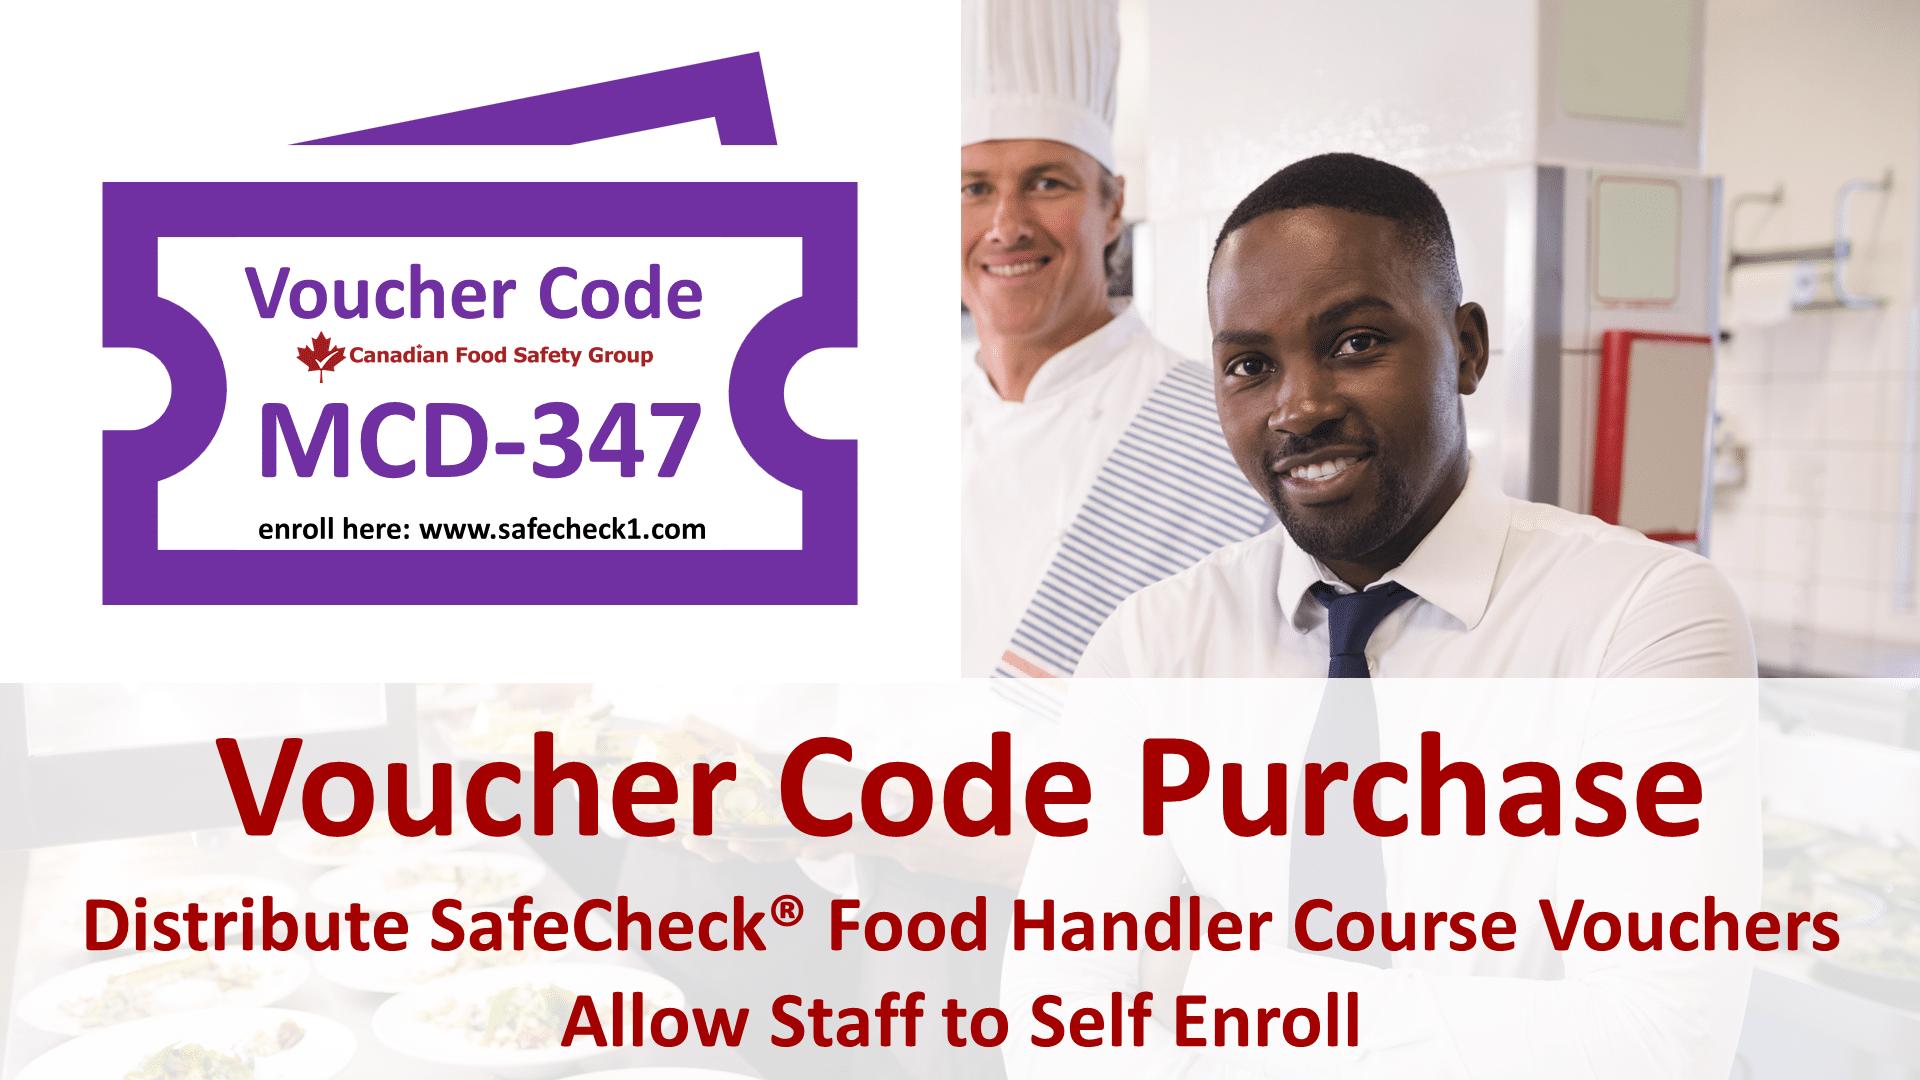 SafeCheck Food Handler Course Voucher Code Purchase